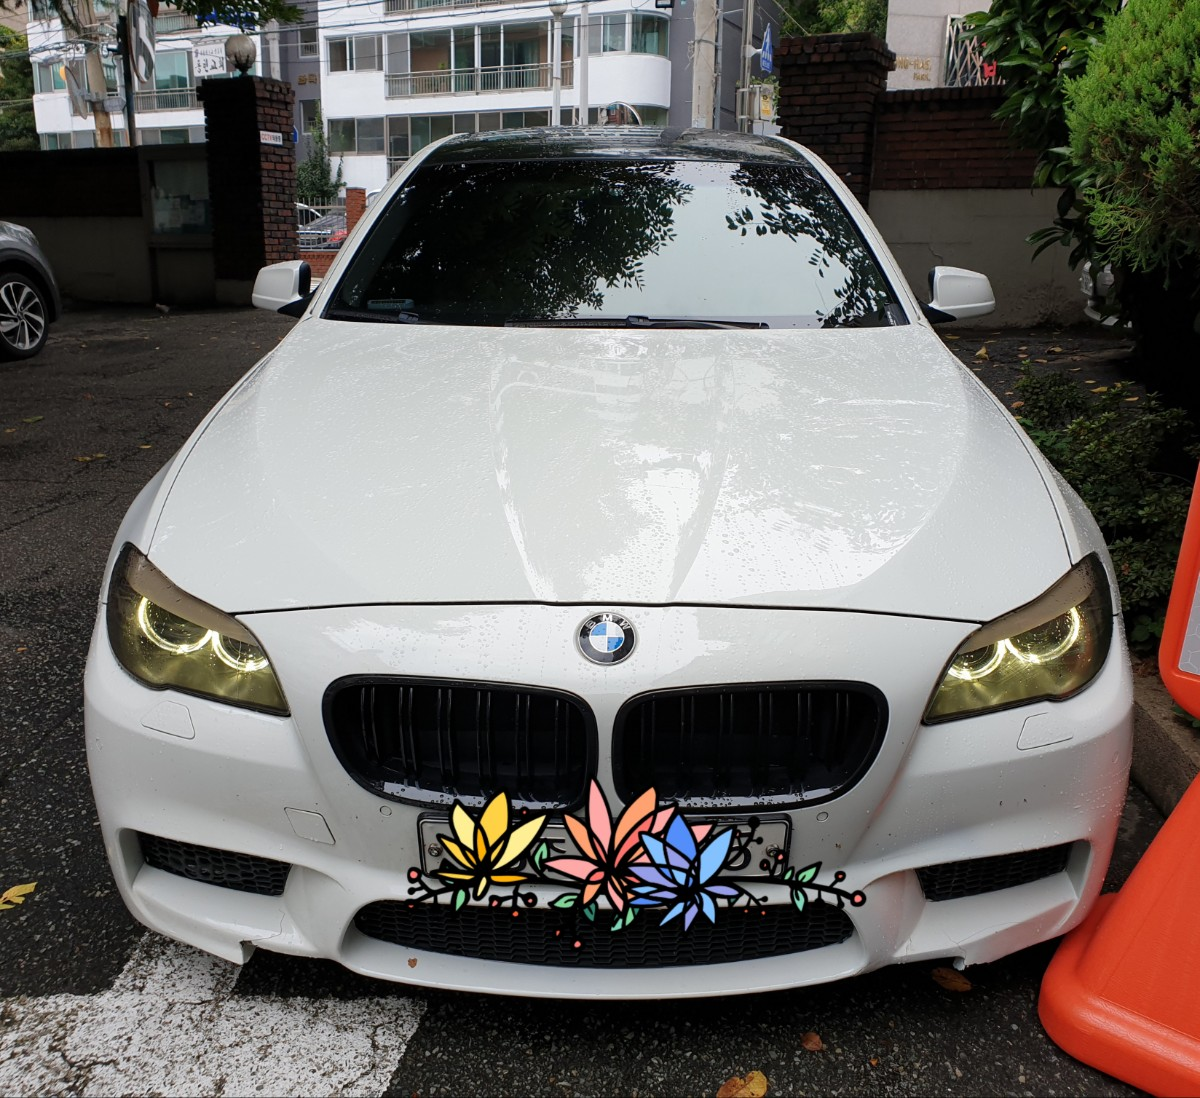 BMW 520D 흰색차량 판매합니다.(대차문의가능) - 0